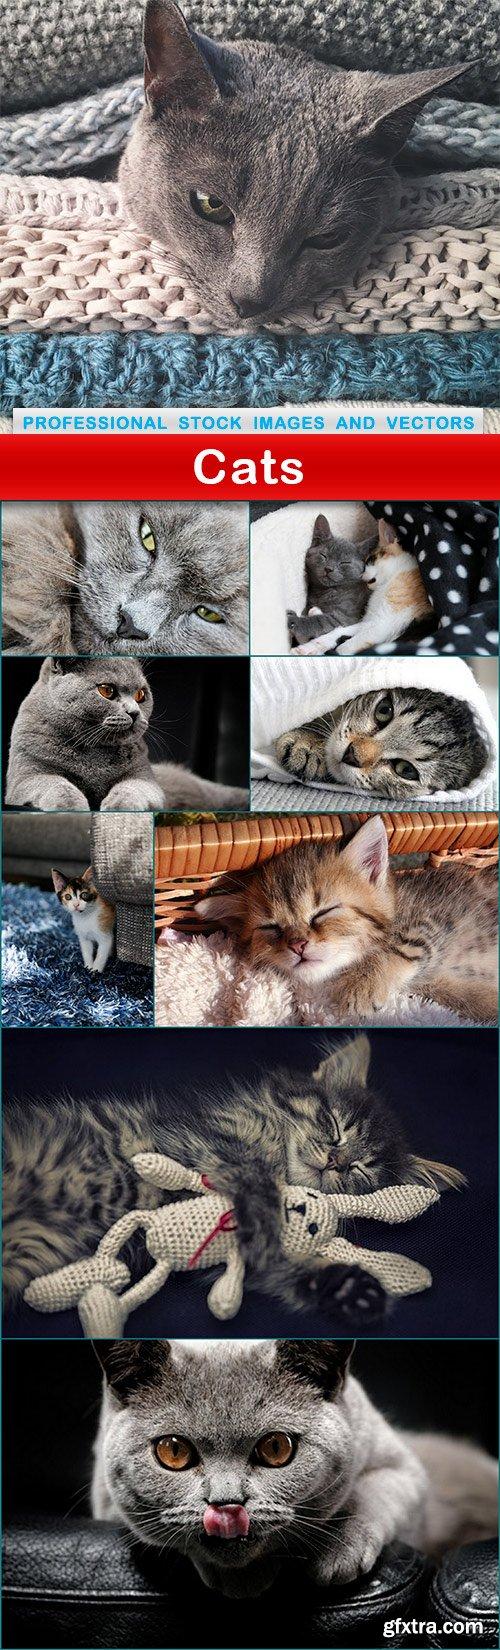 Cats - 9 UHQ JPEG